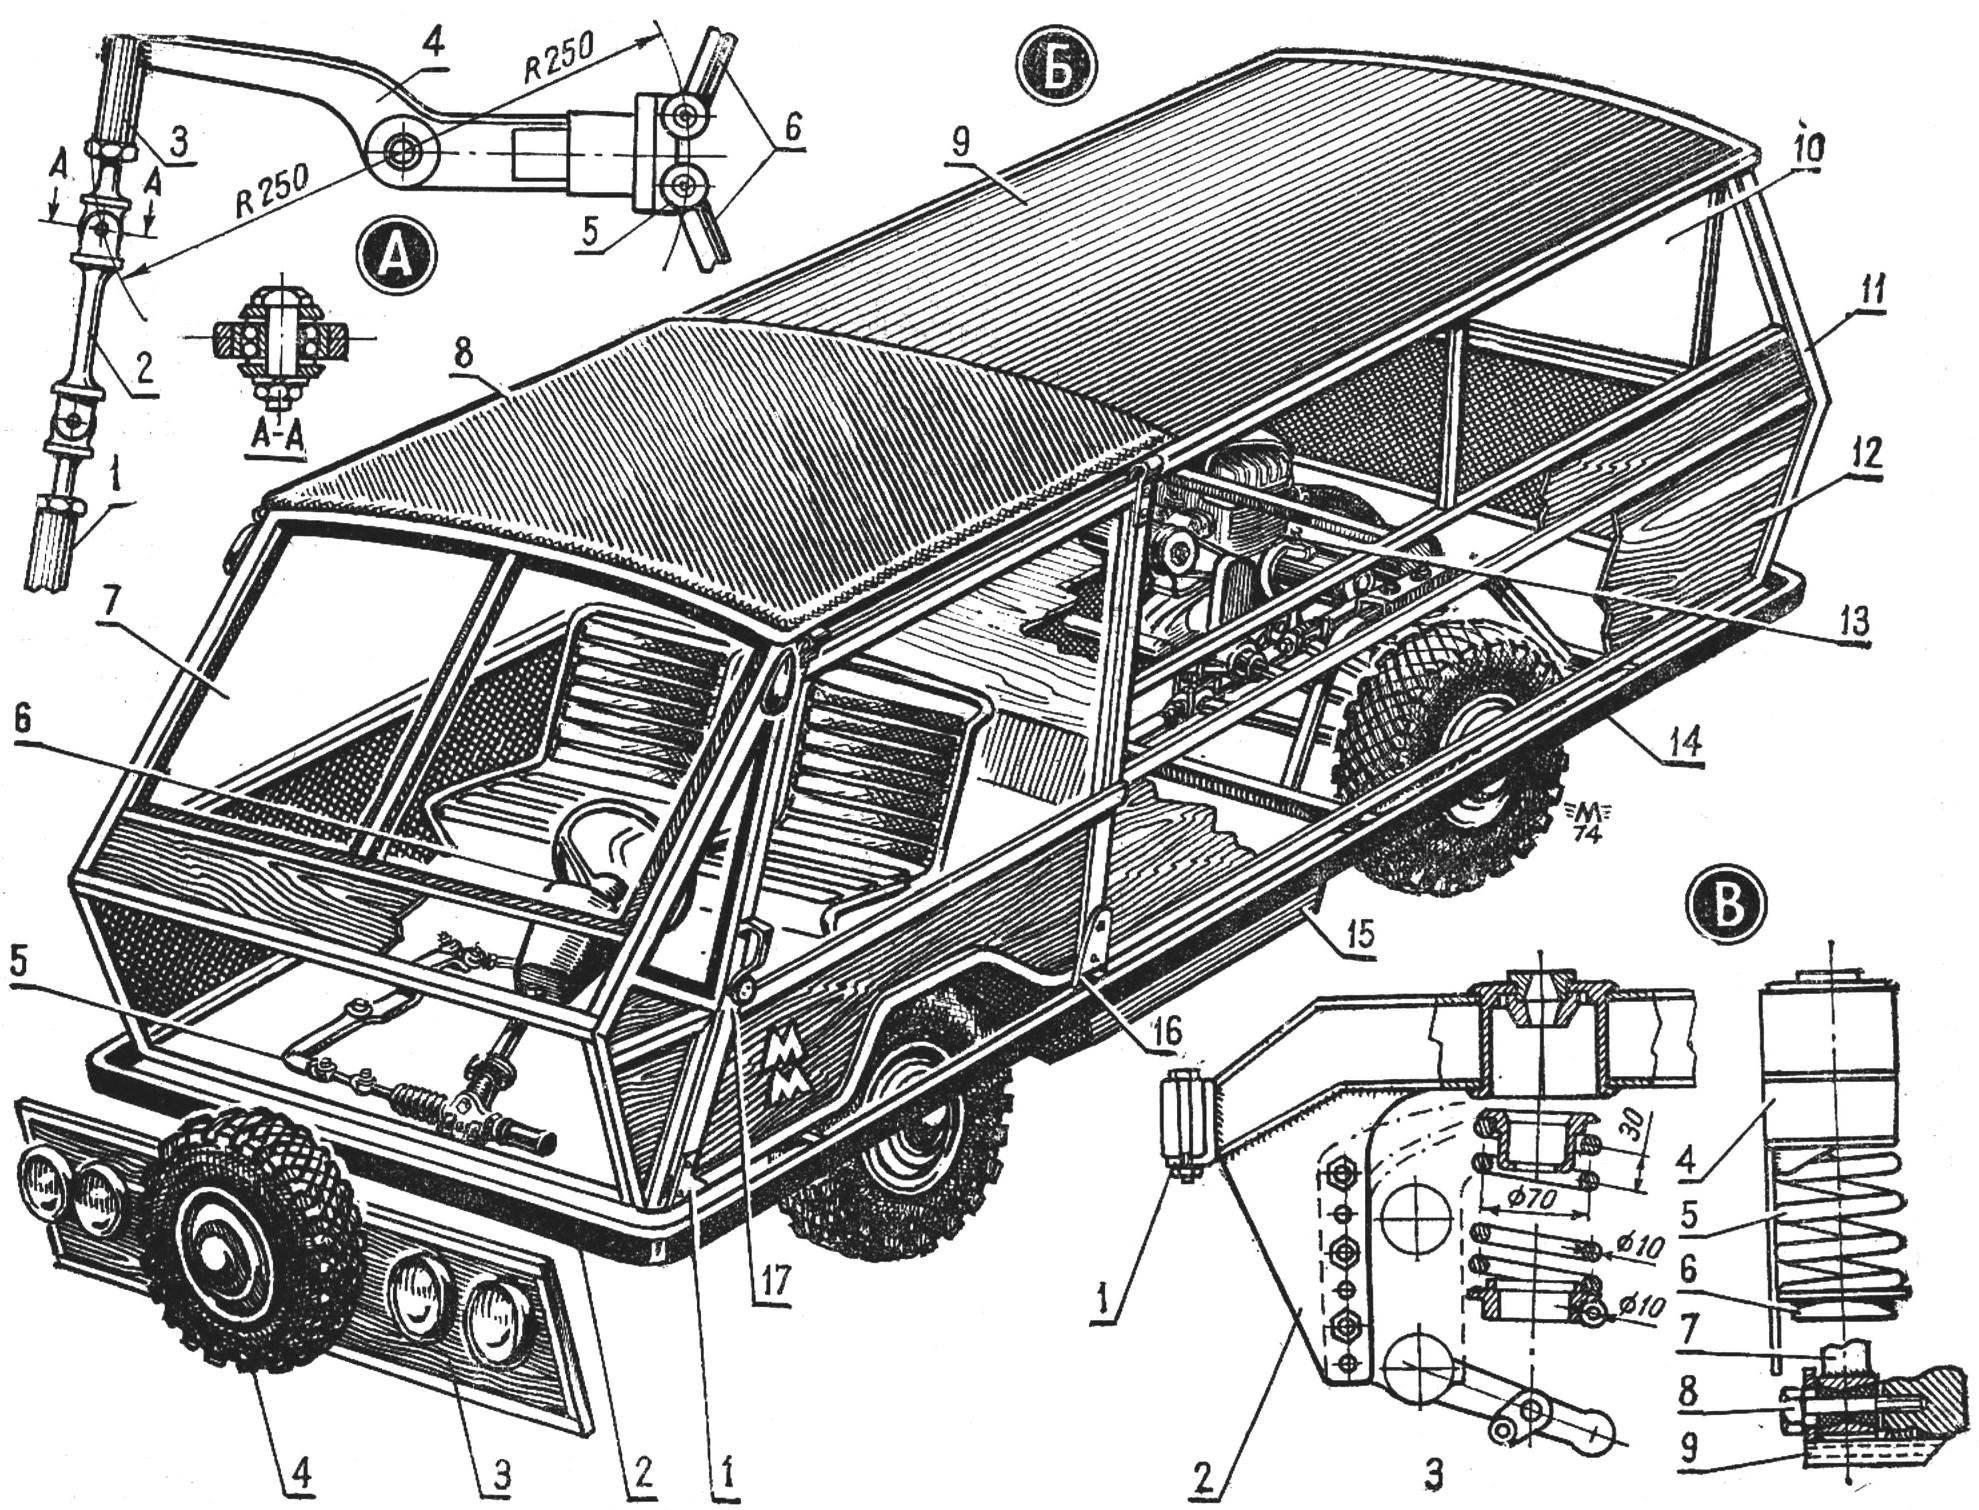 Рис. 1. Компоновка микроавтомобиля «Минимакс» и детали подвески